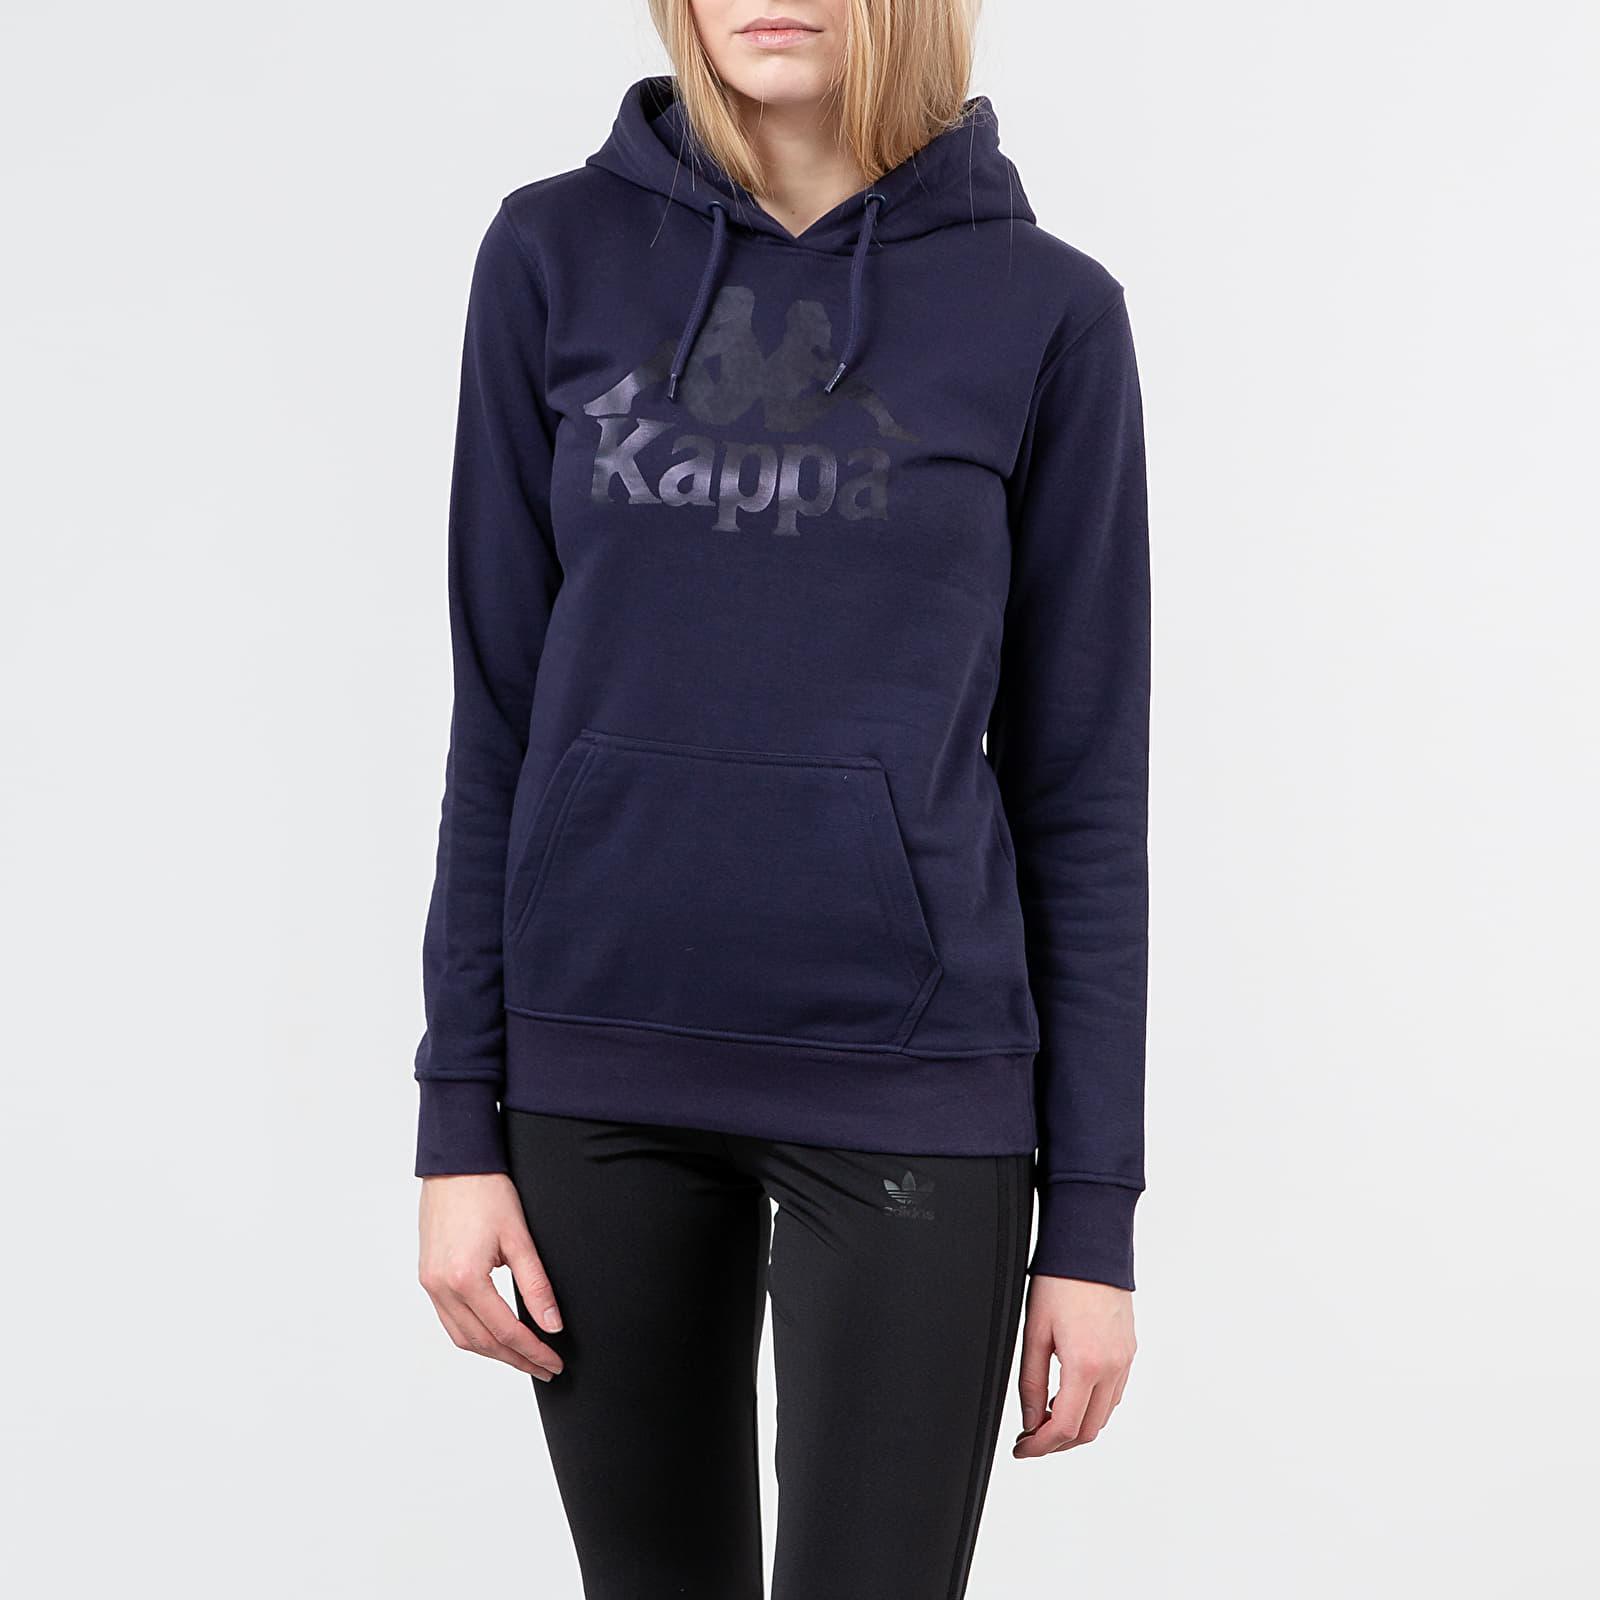 Sweatshirts Kappa Authentic Zouk Hoodie Blue Greystone